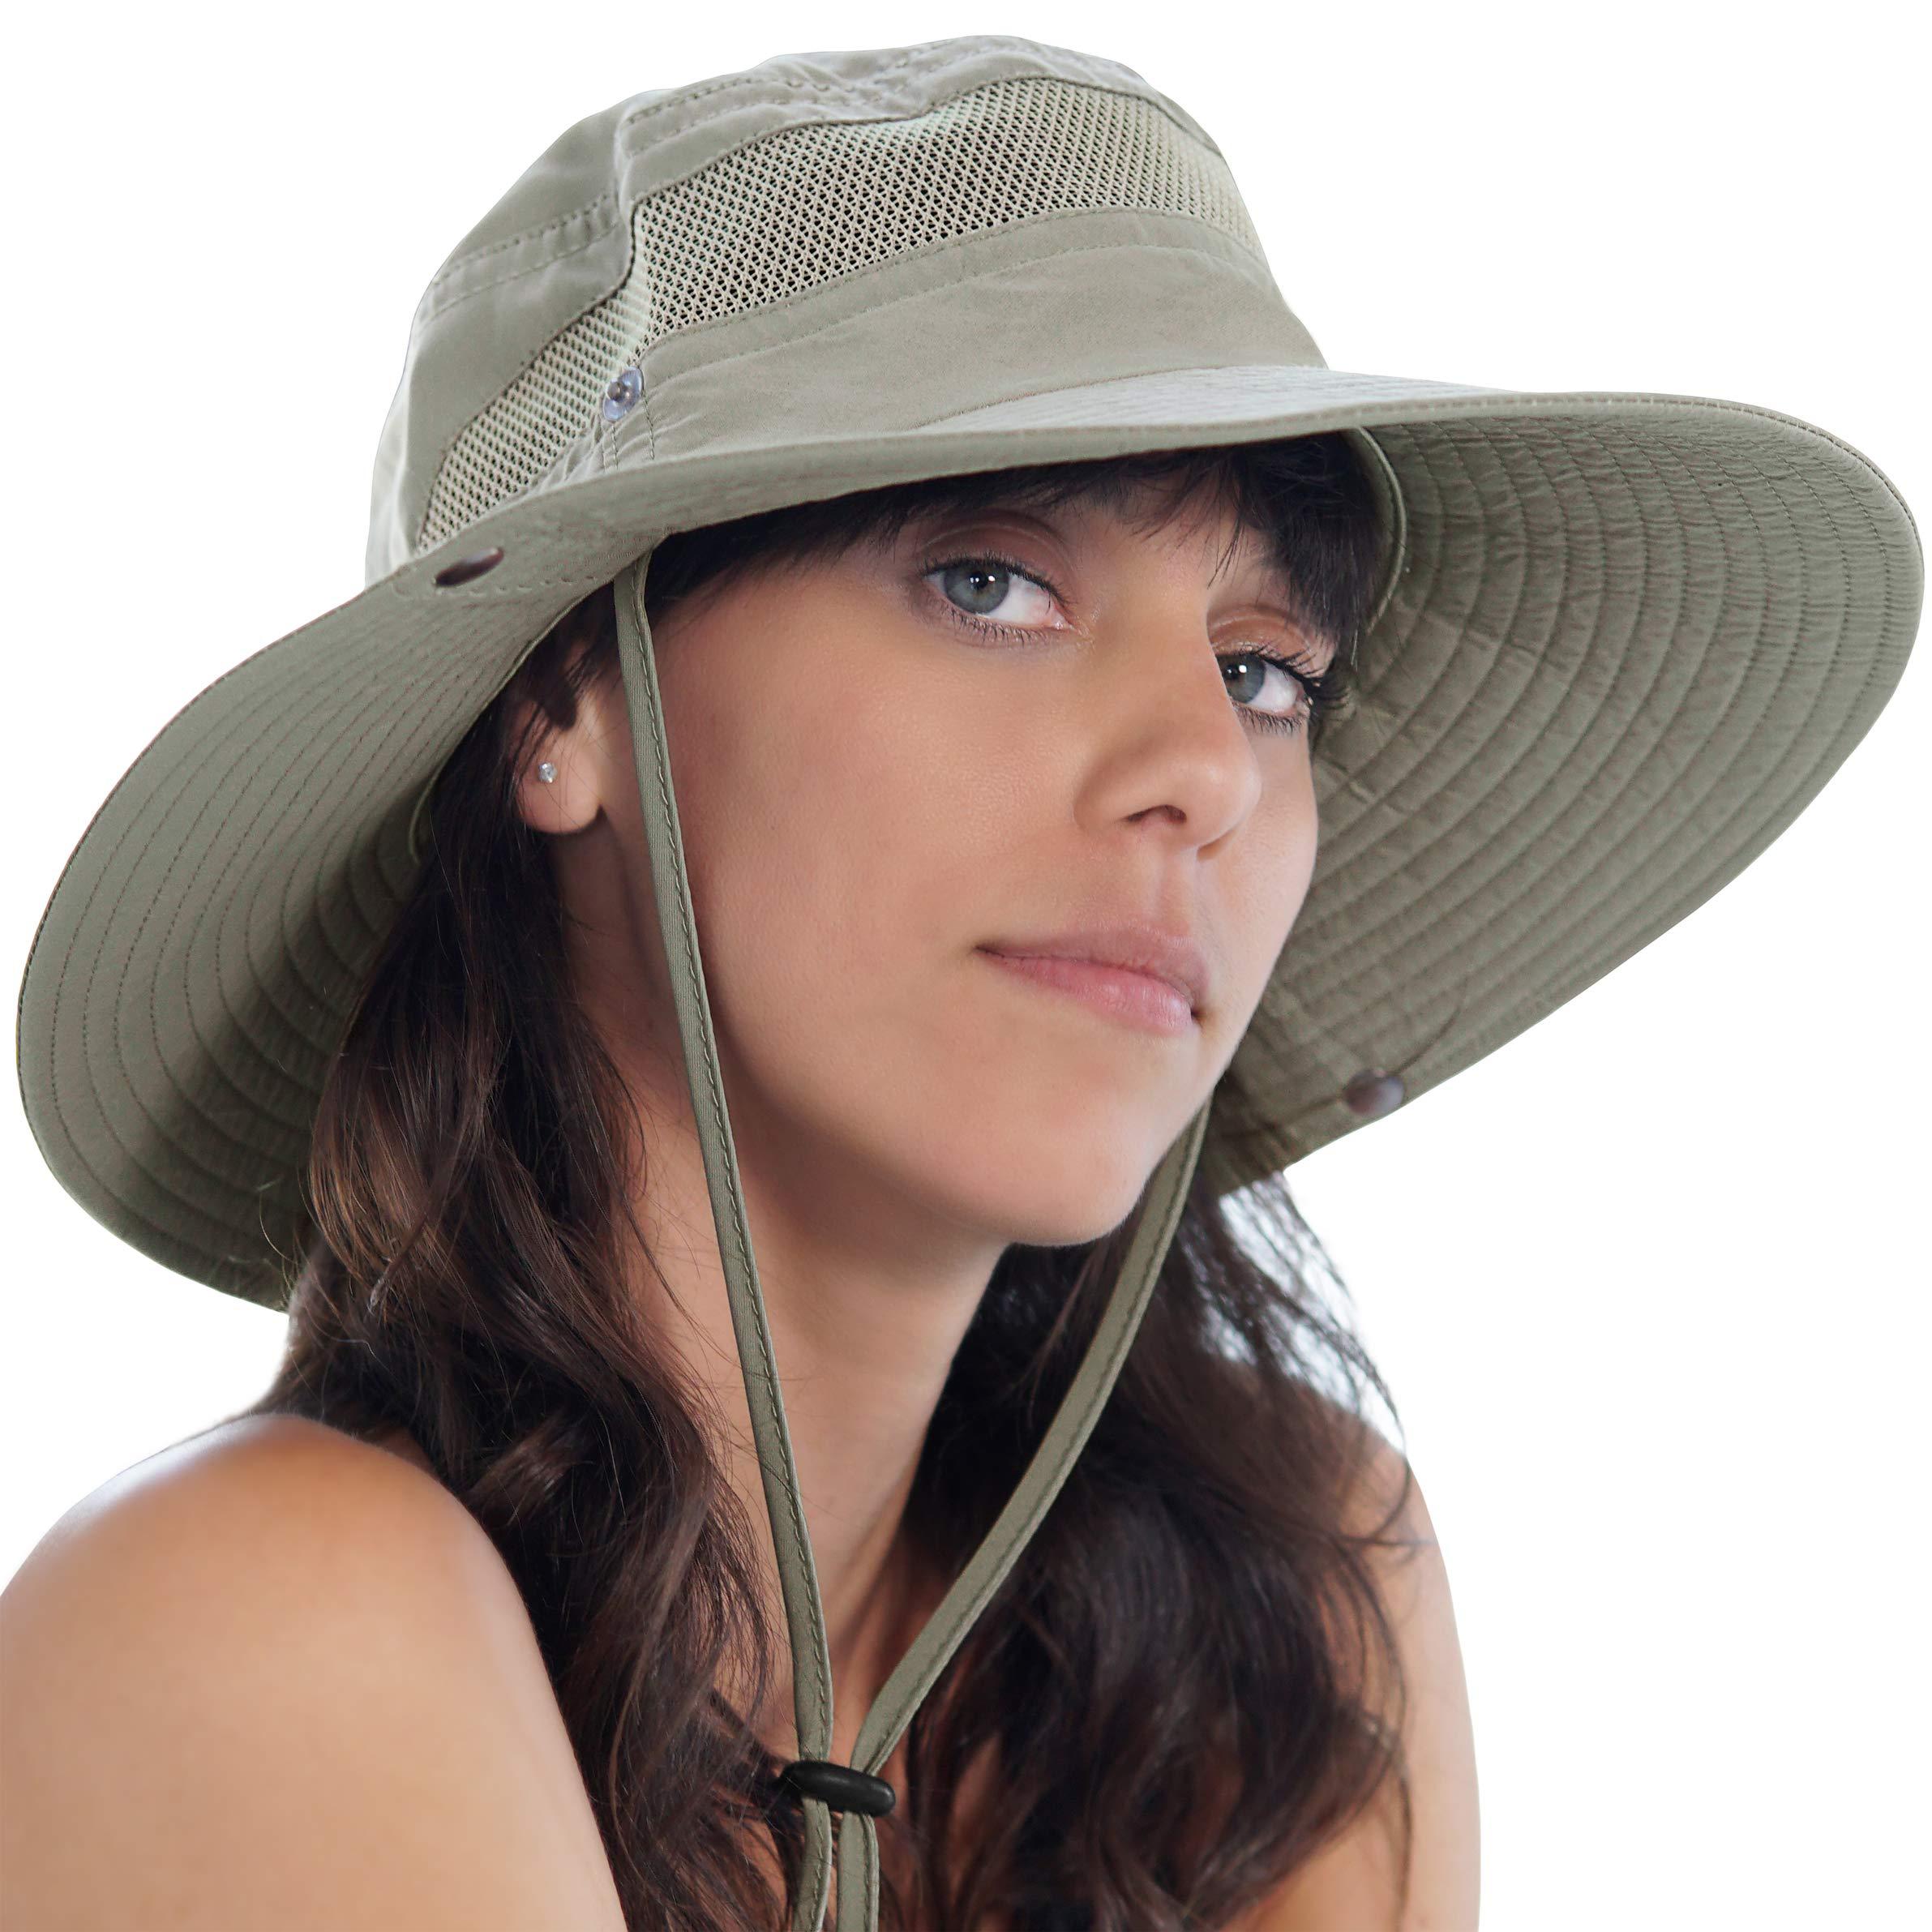 GearTOP Fishing Hat (Khaki - 2 Pack) by GearTOP (Image #8)